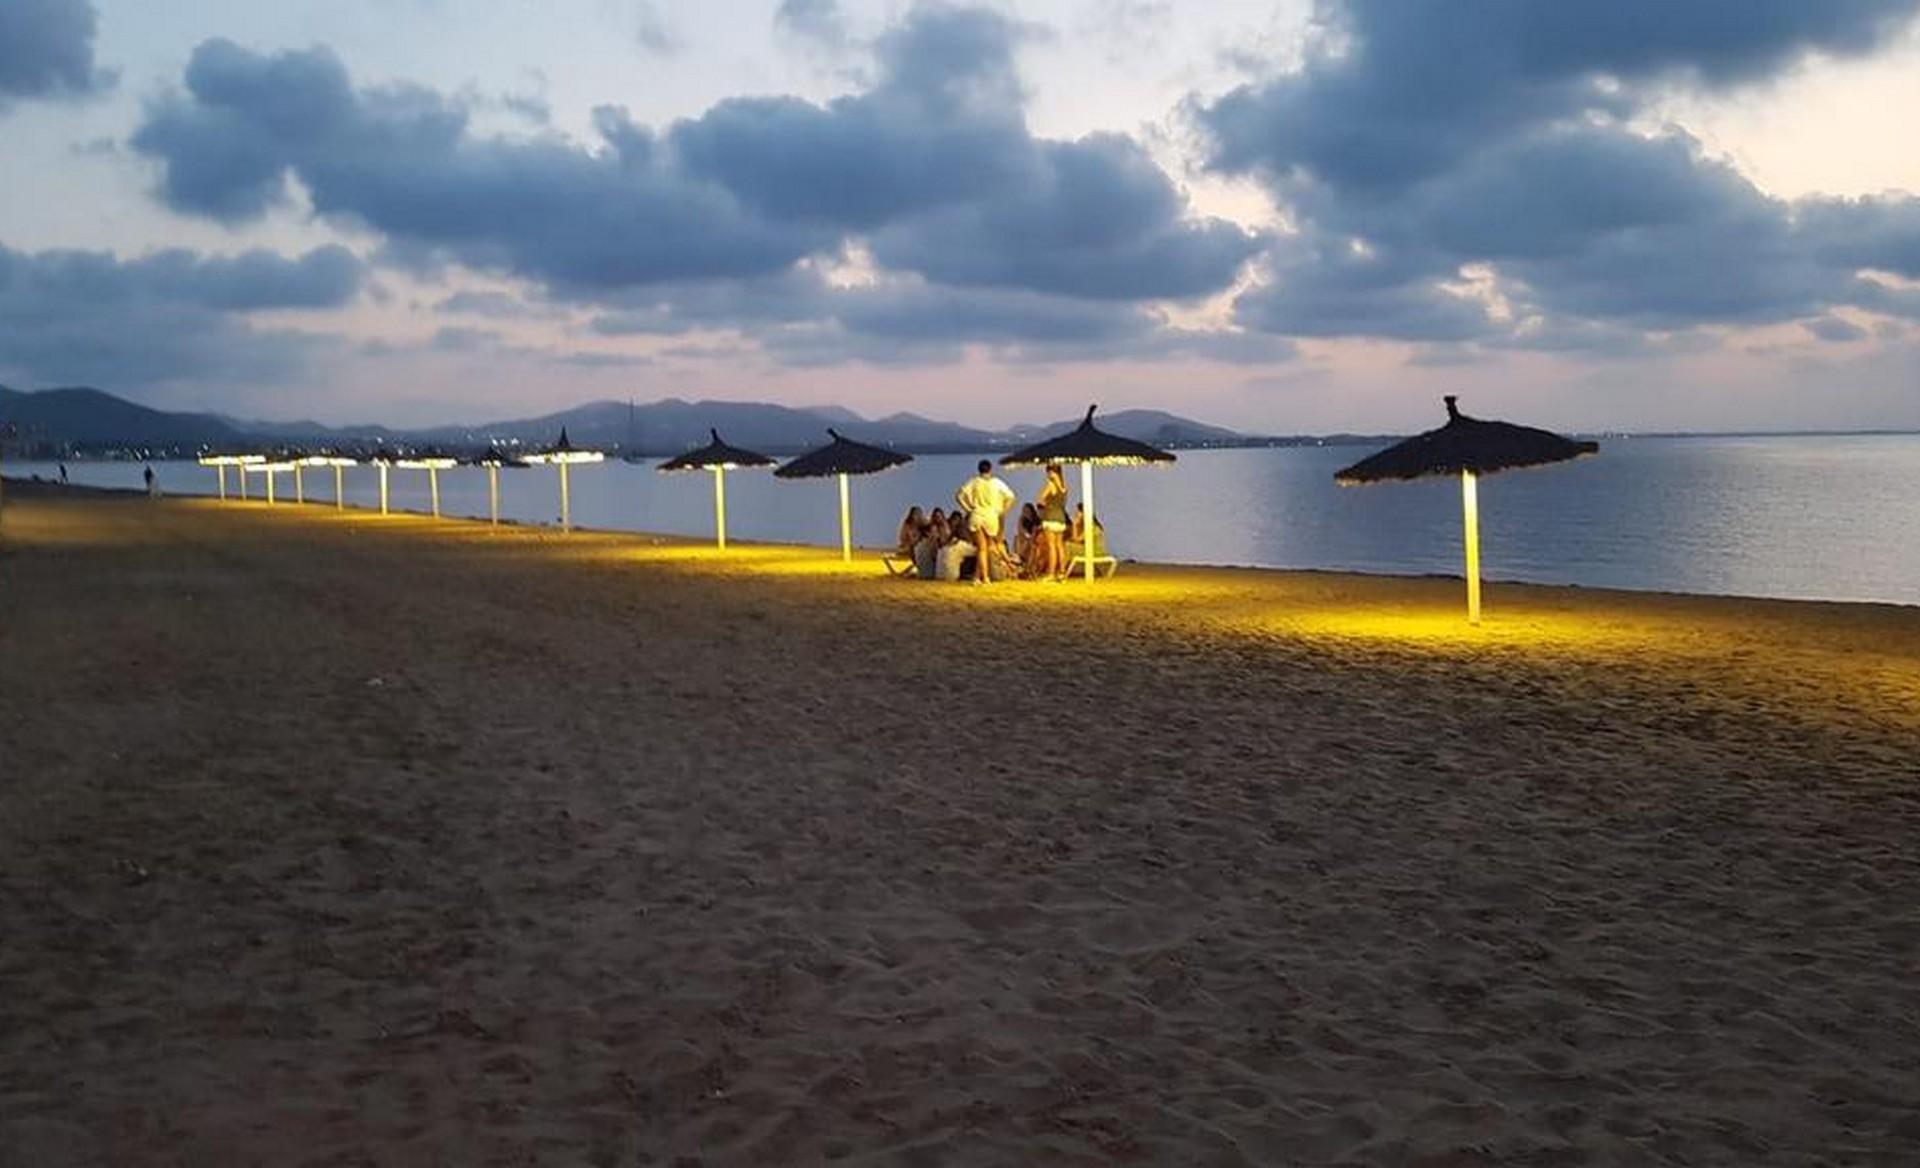 Playa Honda Murcia